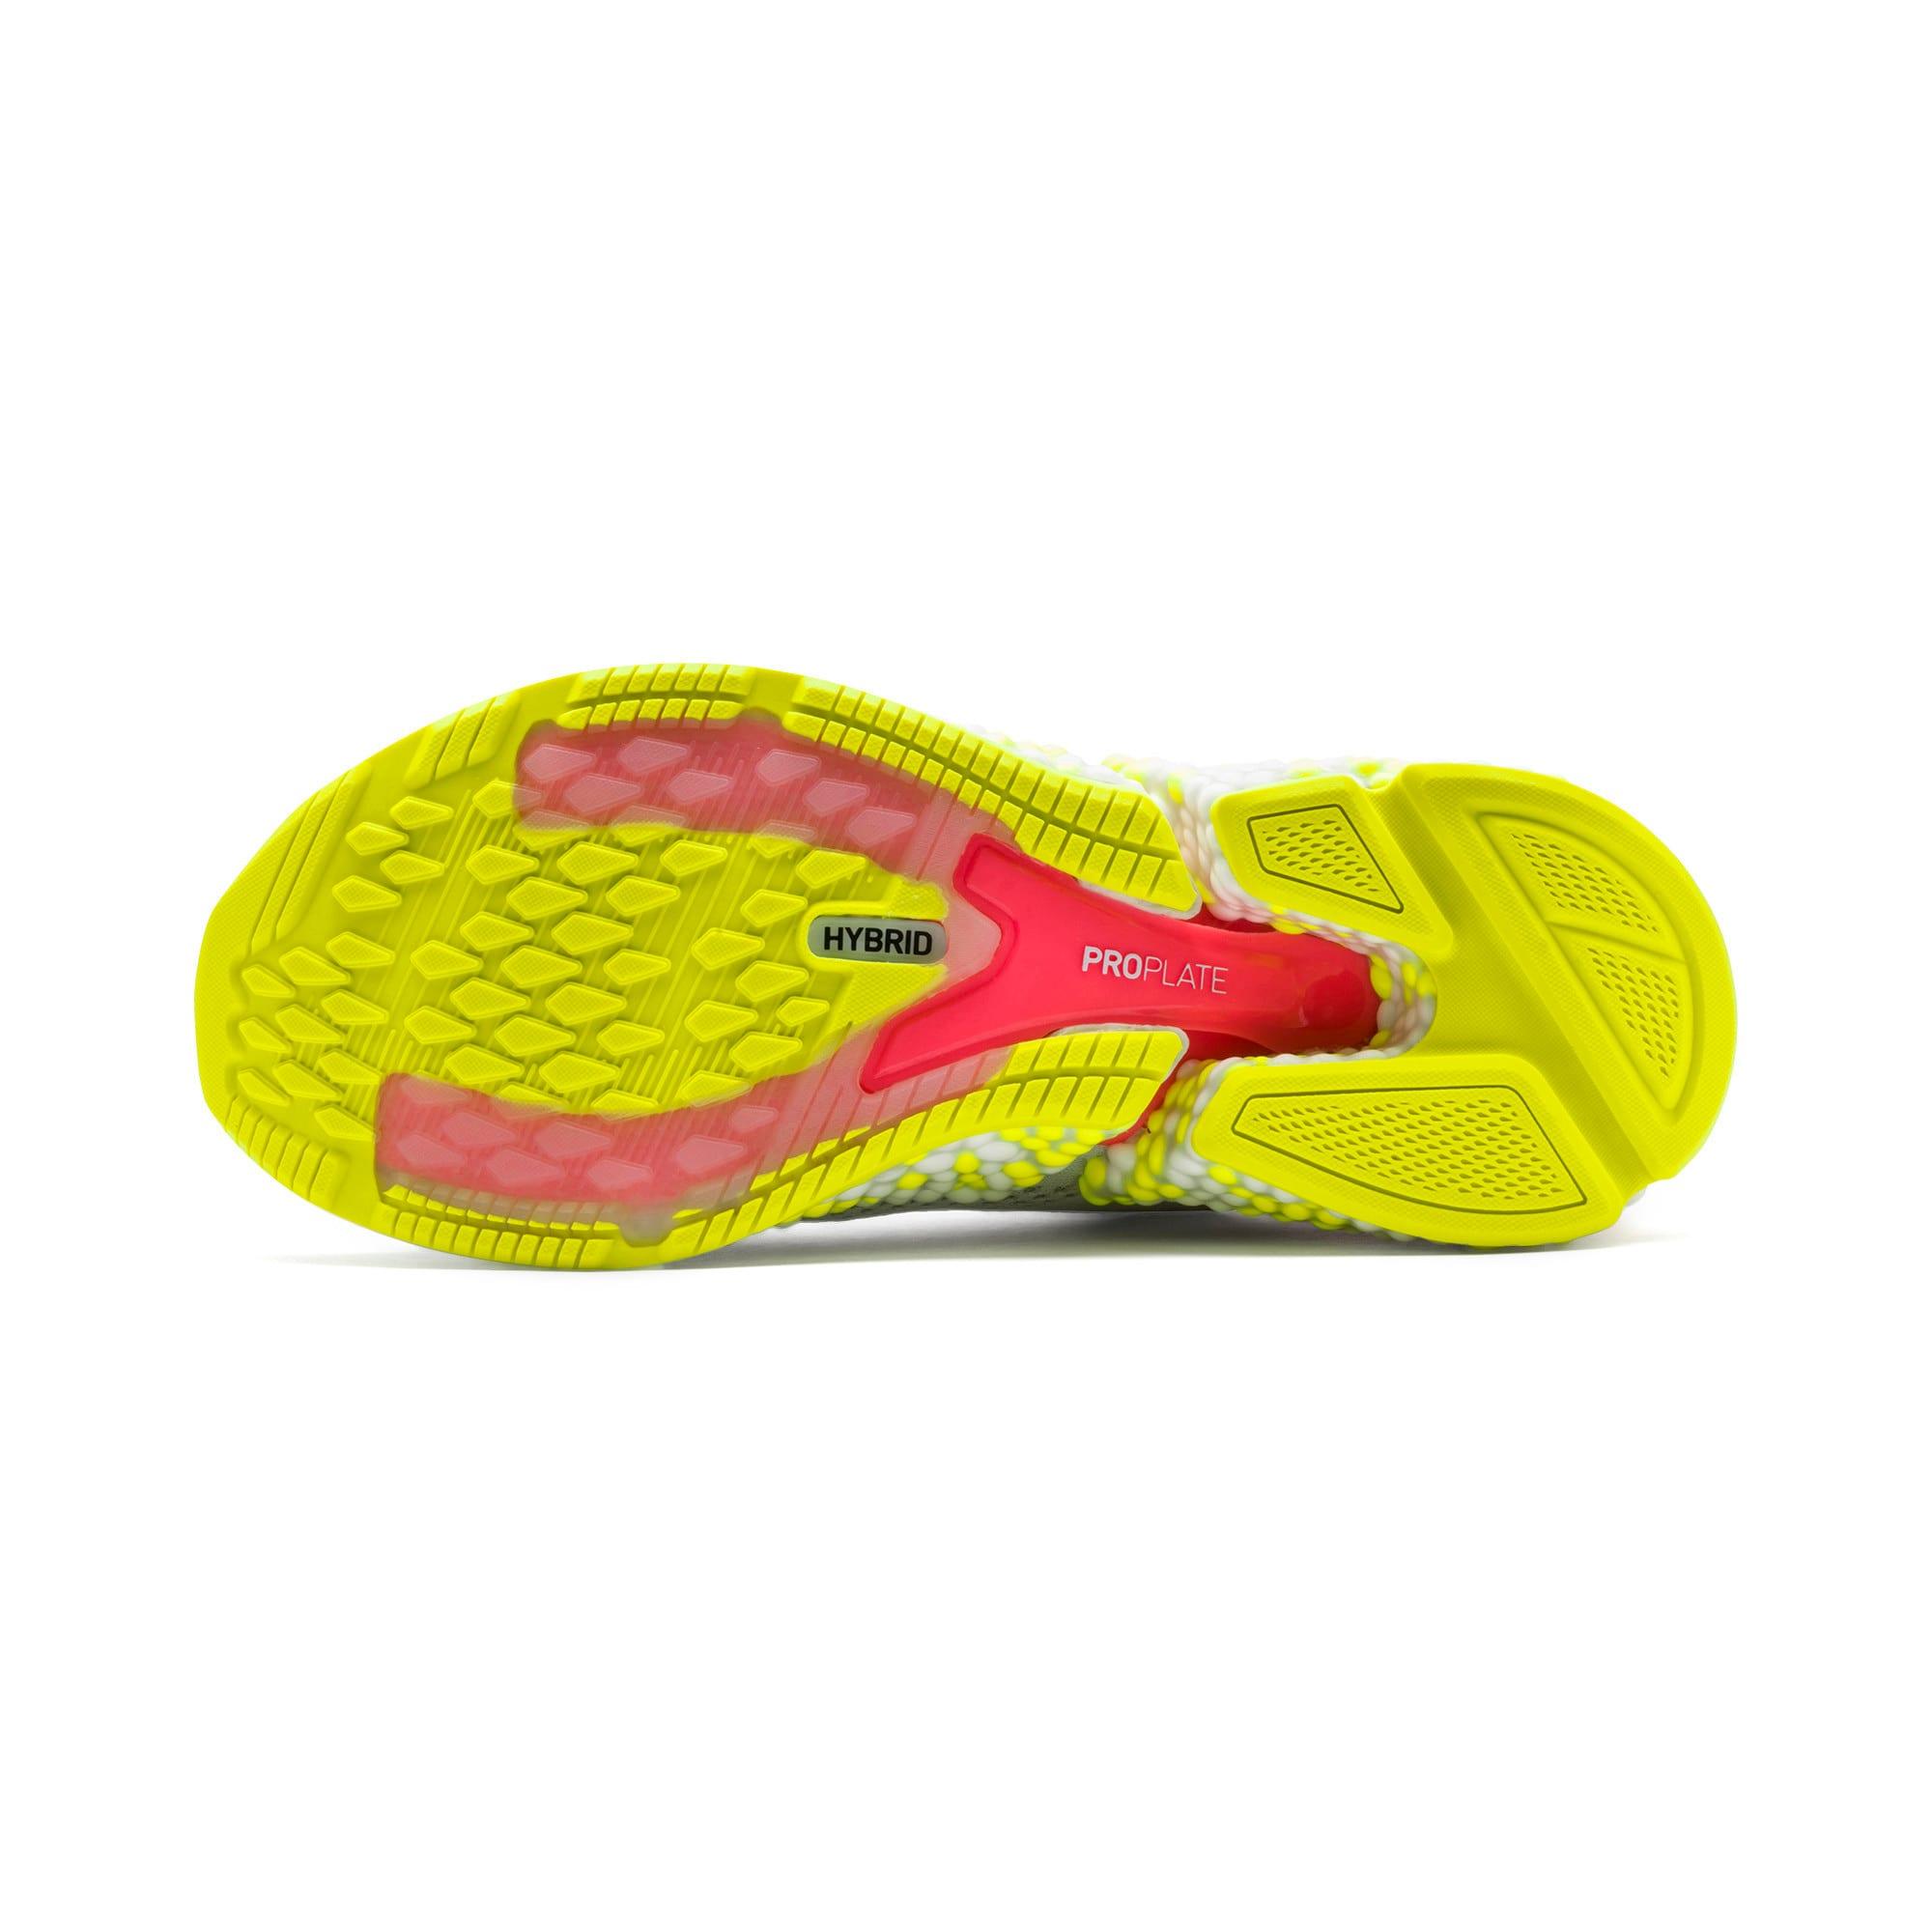 Thumbnail 5 of HYBRID SPEED Orbiter Women's Running Shoes, Puma White-Yellow Alert, medium